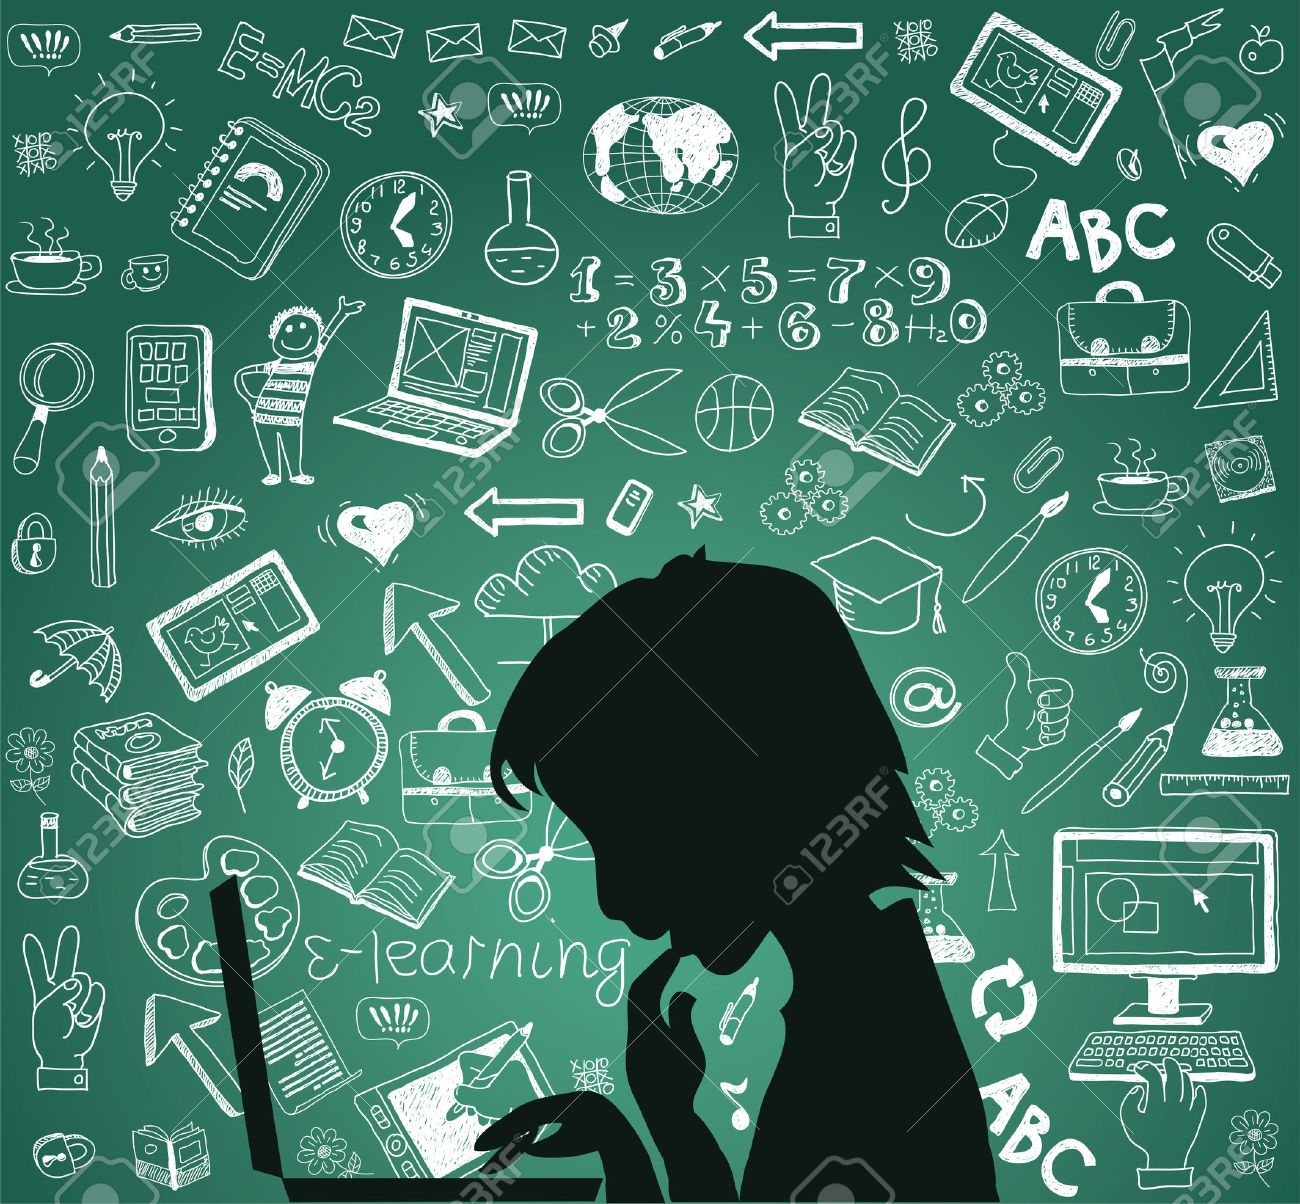 Back to school - doodle set, concept background education. - 46202952